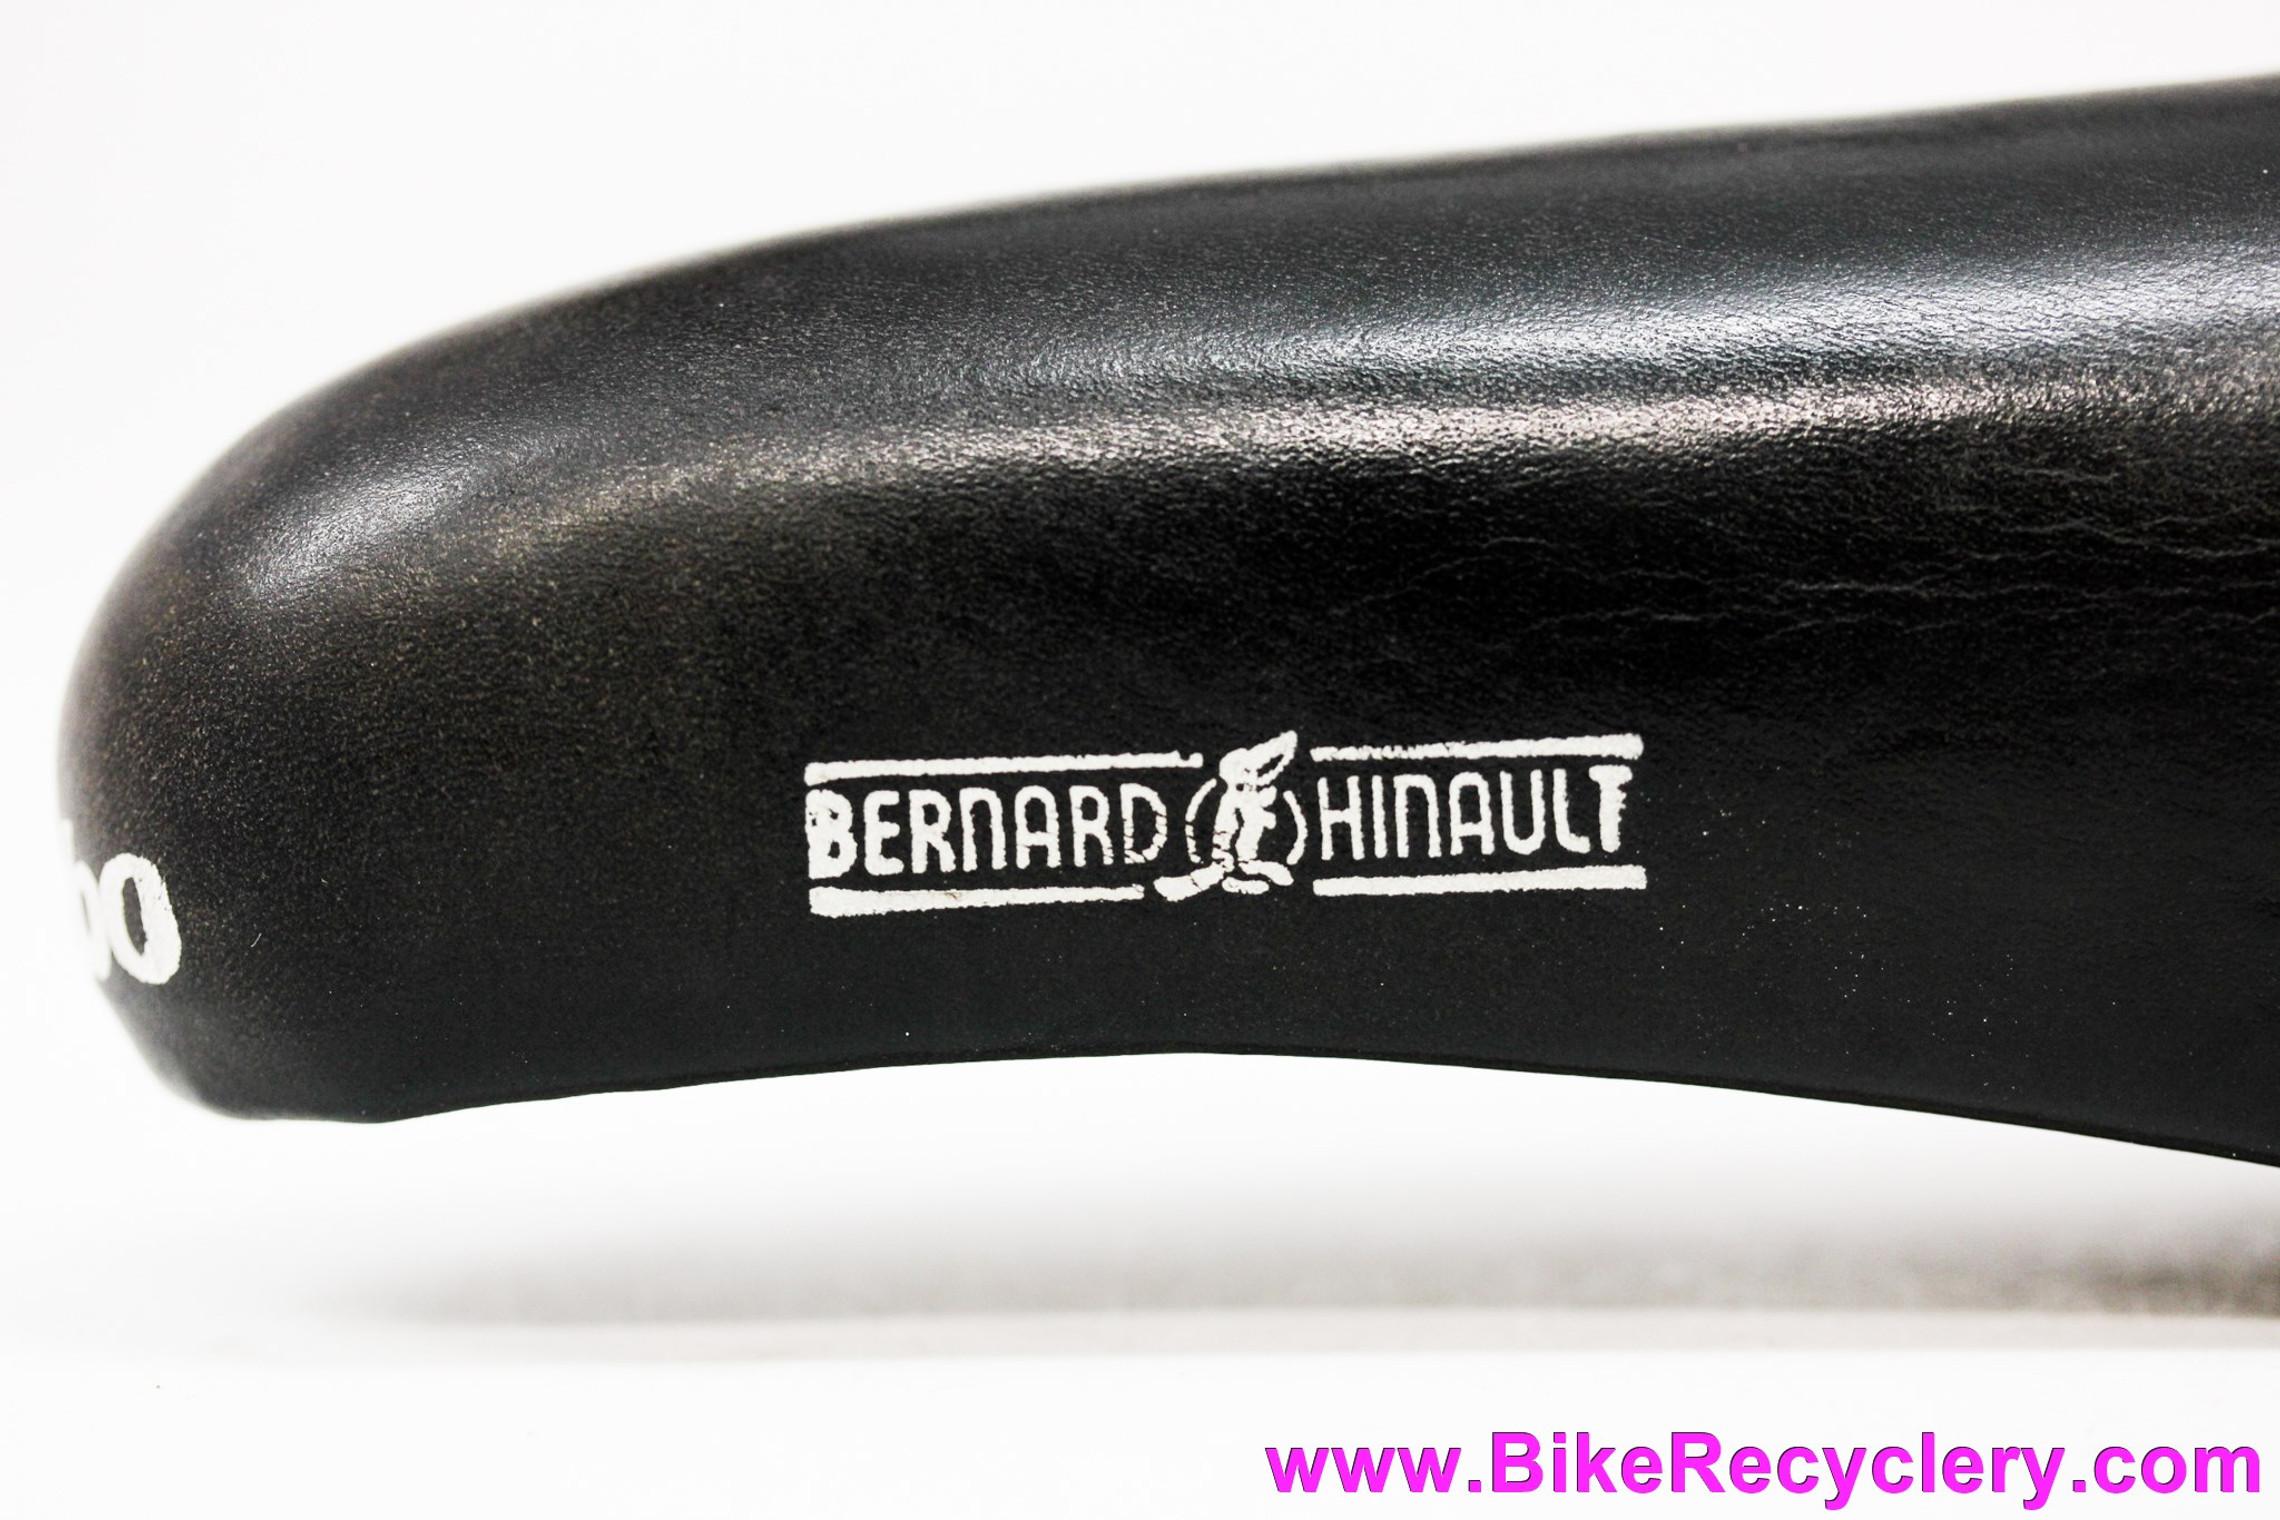 NOS Selle Italia Turbo Hinault V2 Saddle: Smooth Black Leather - White Decals (Take-Off)